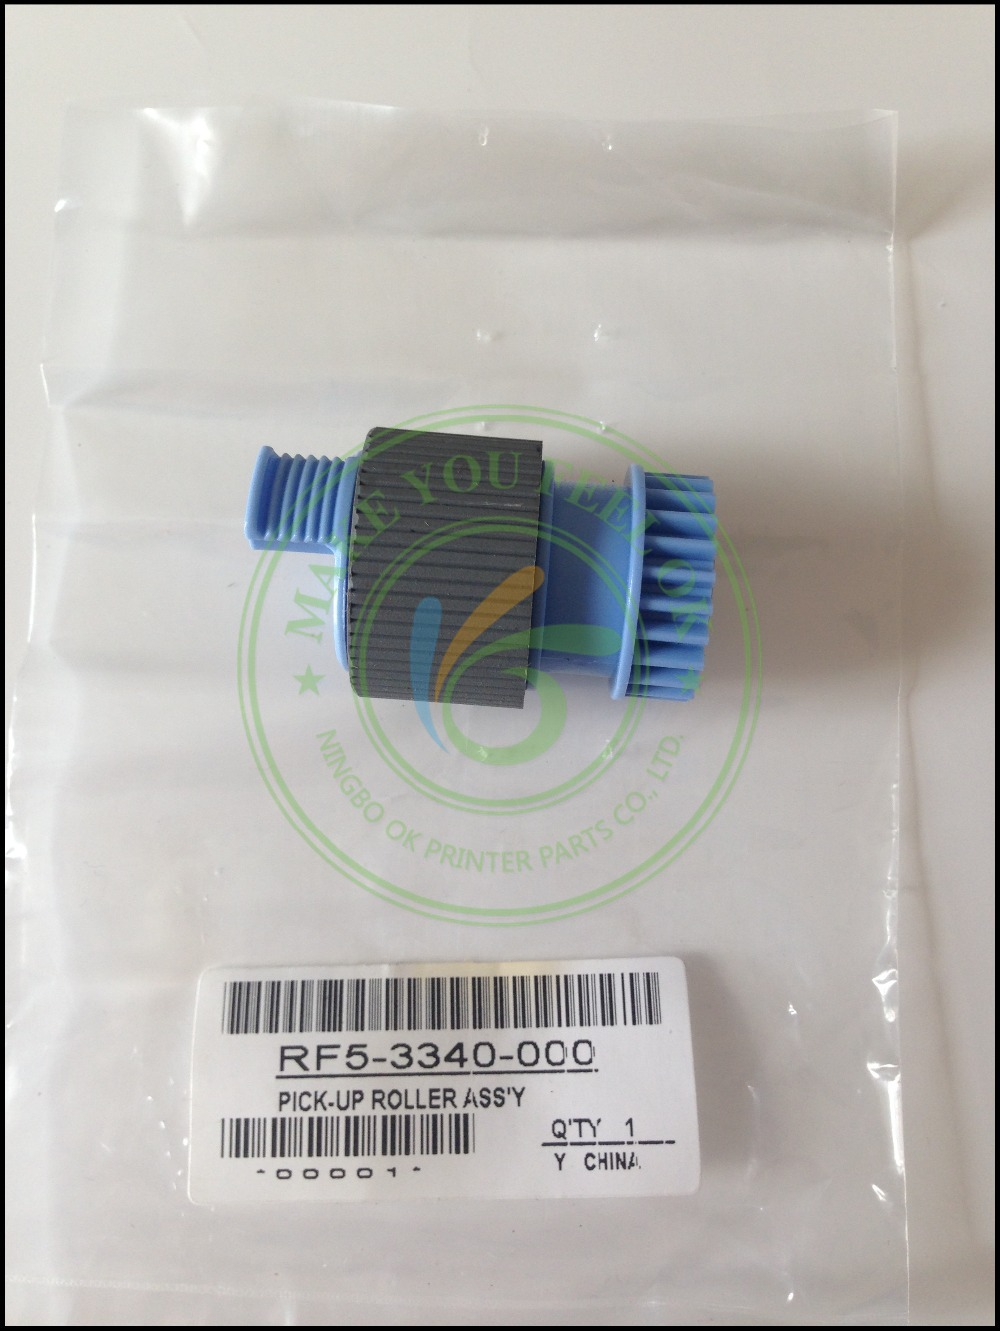 Совместимый, RF5-3340-000 RF5-3340 лоток 2 и 3 подбирающий валец для hp 5500 5550 9000 9040 9050 9500